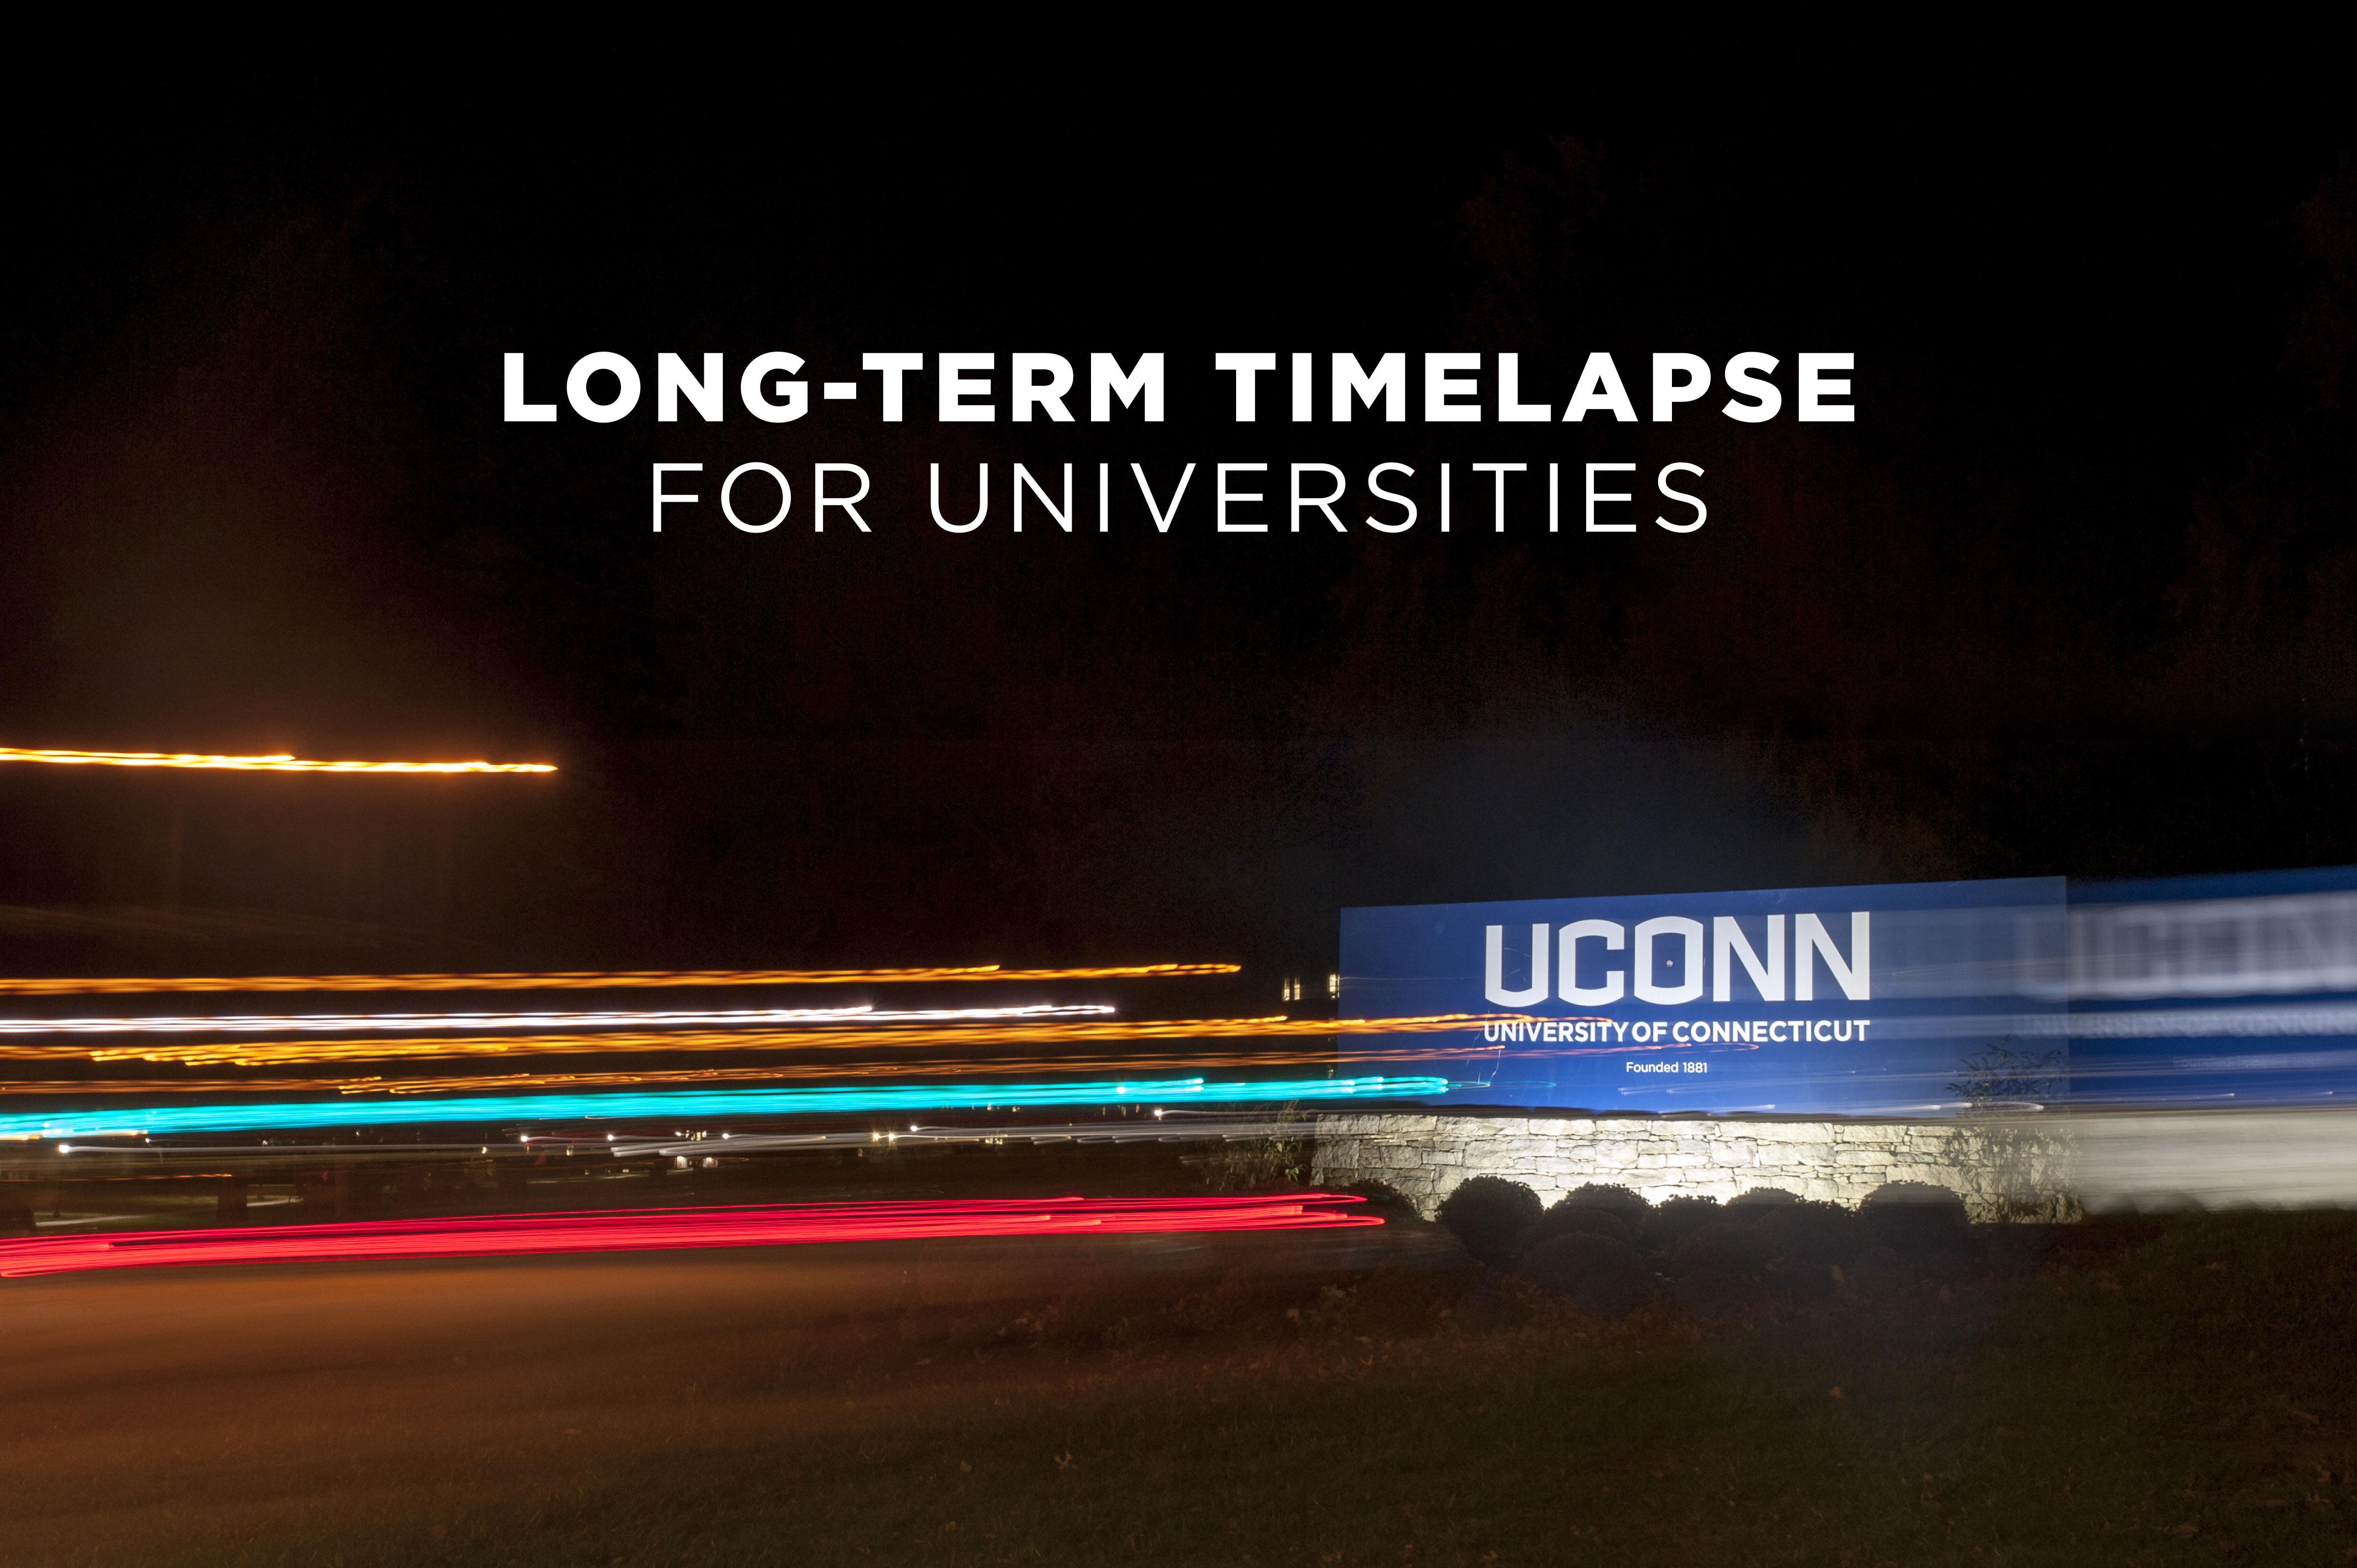 long term timelapse videos for universities